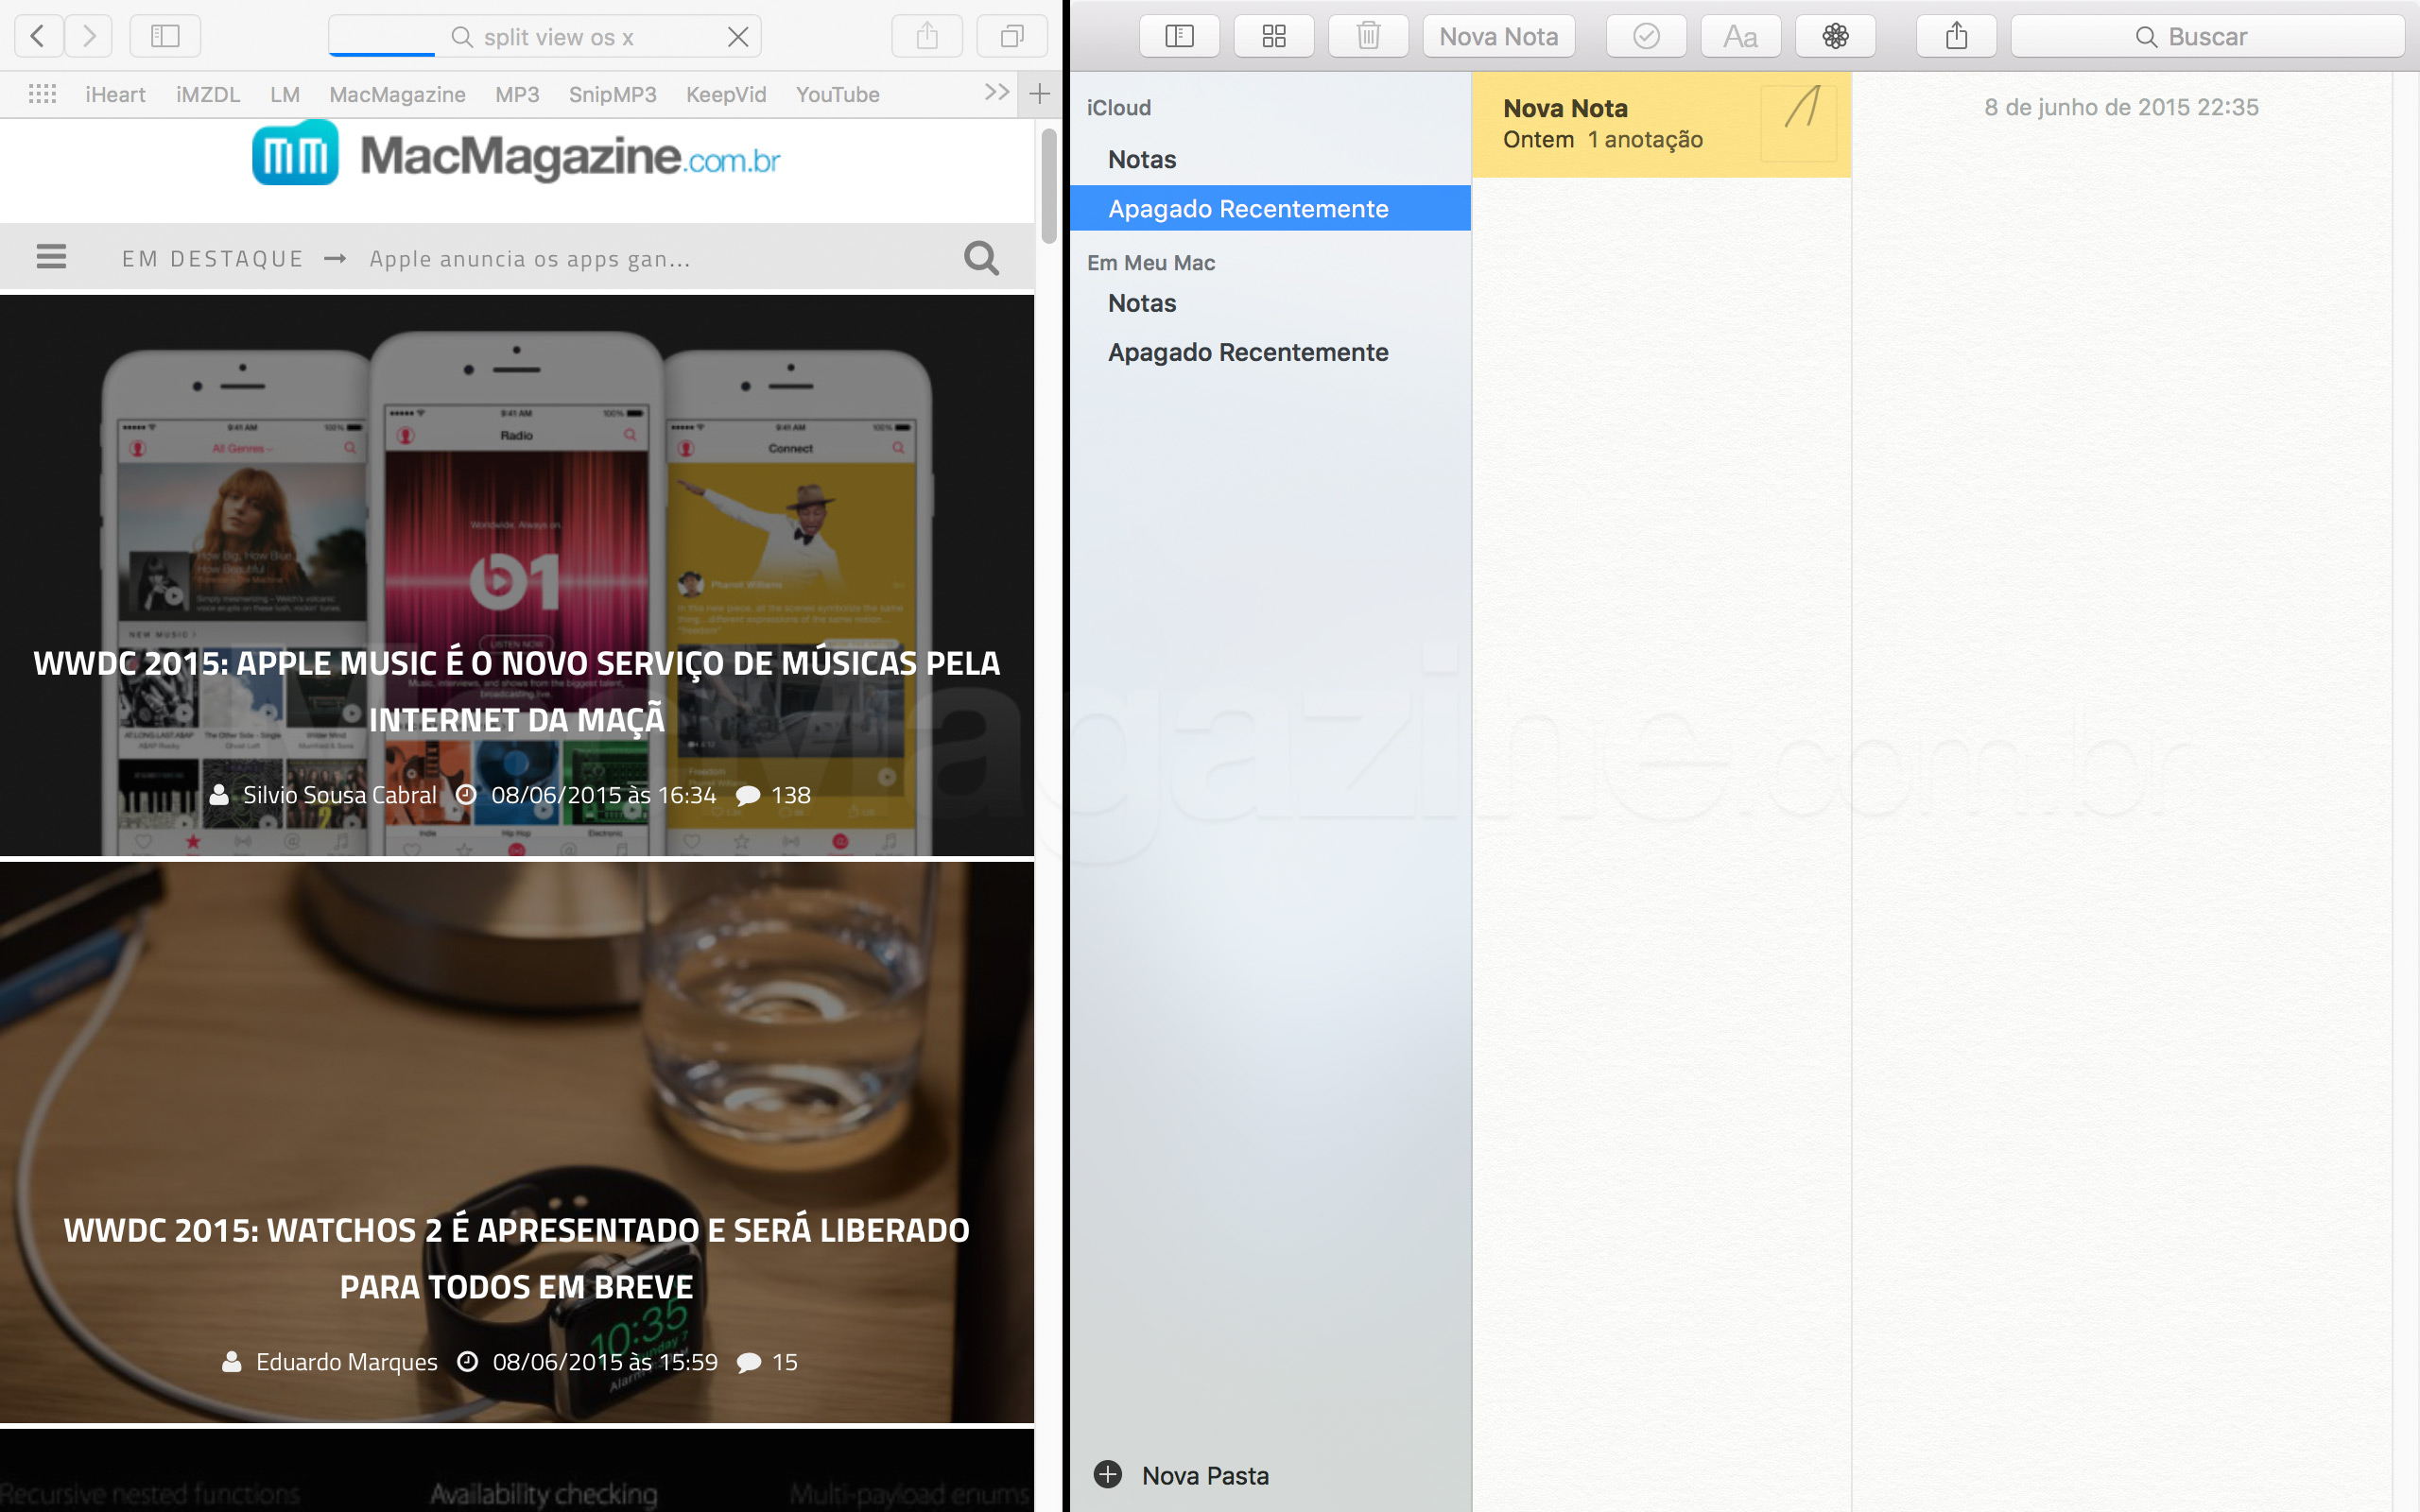 Screenshot do OS X El Capitan 10.11